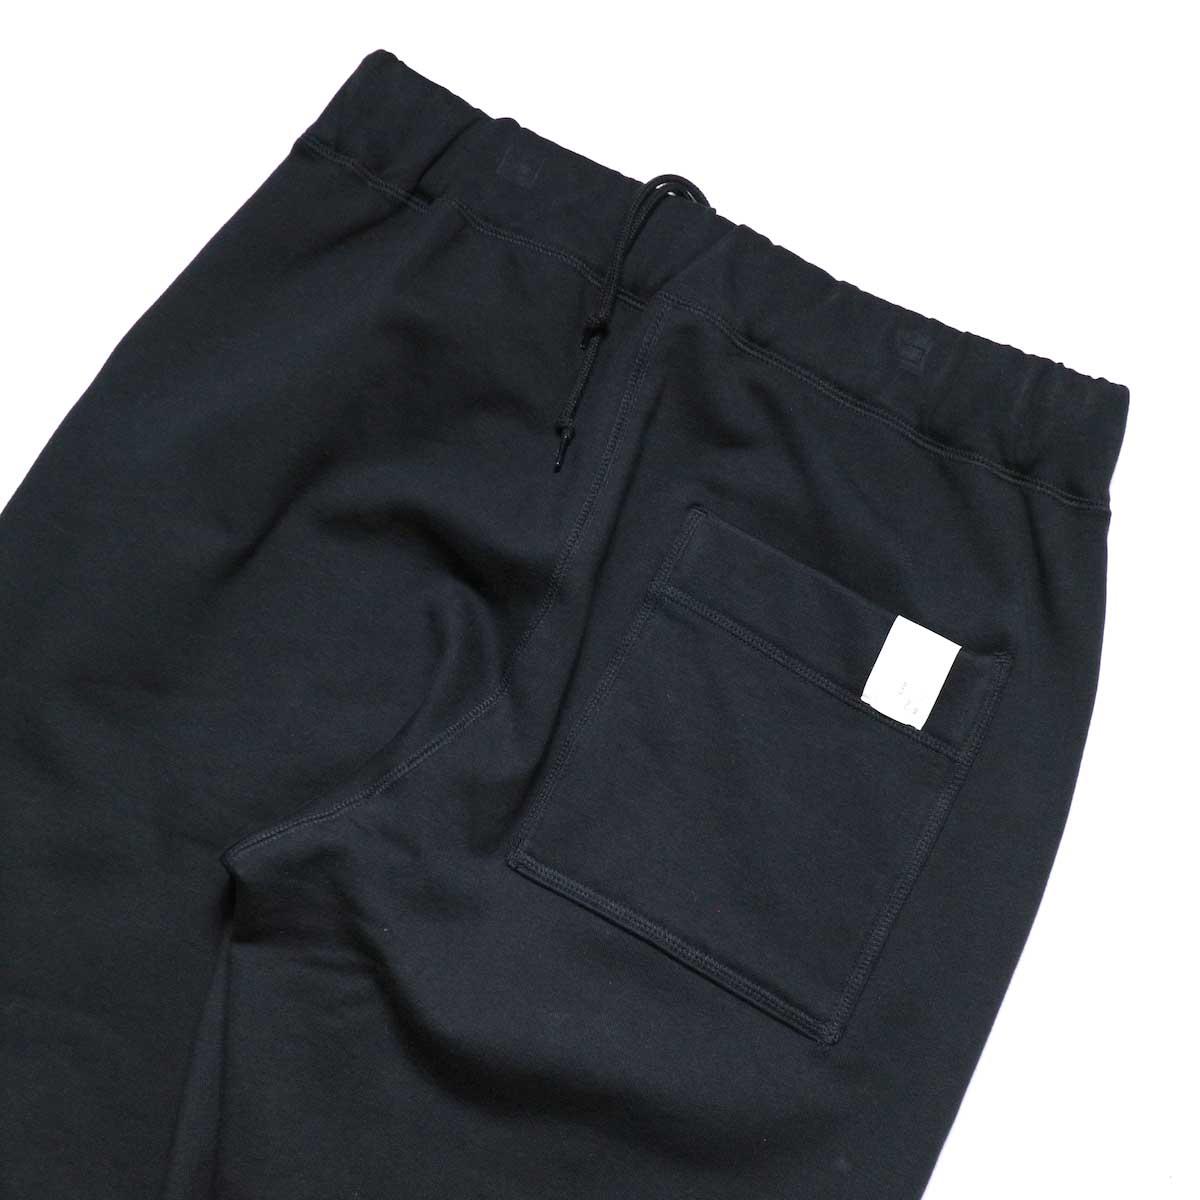 N.HOOLYWOOD / 27RCH-013 Track Pants (Black) ヒップポケット